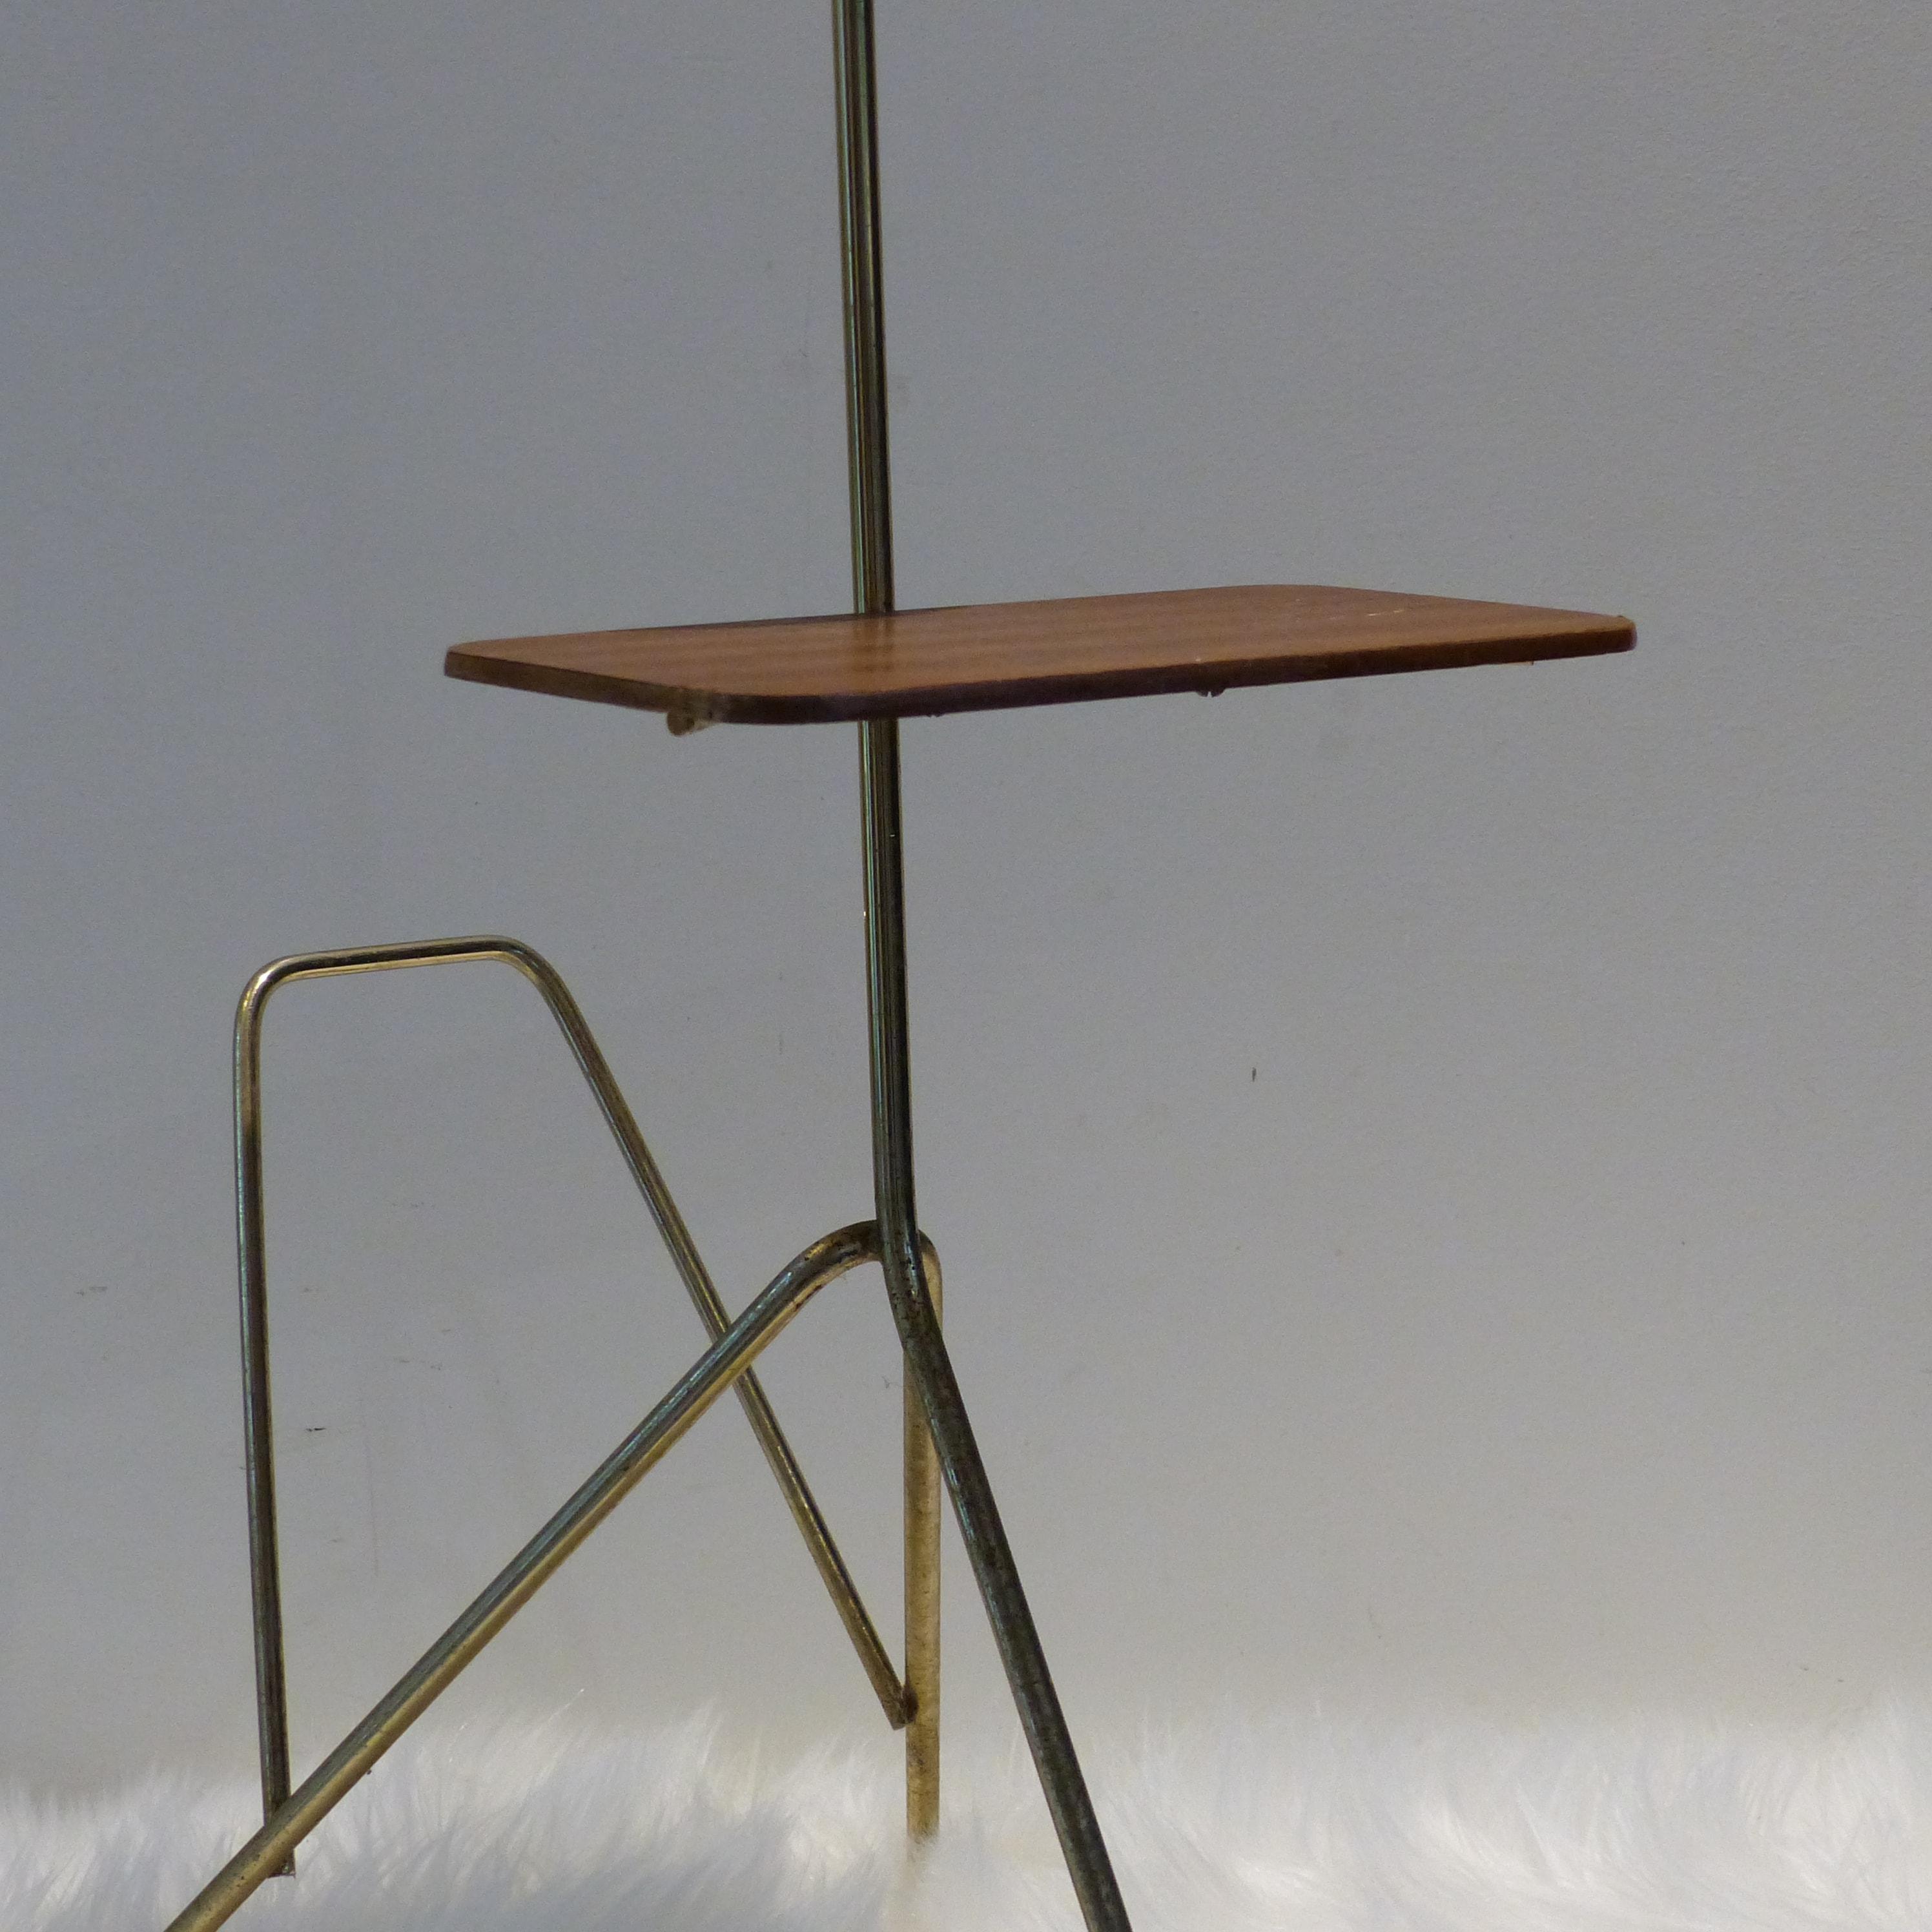 Cendrier vintage sur pied lignedebrocante brocante en for Porte revues en bois